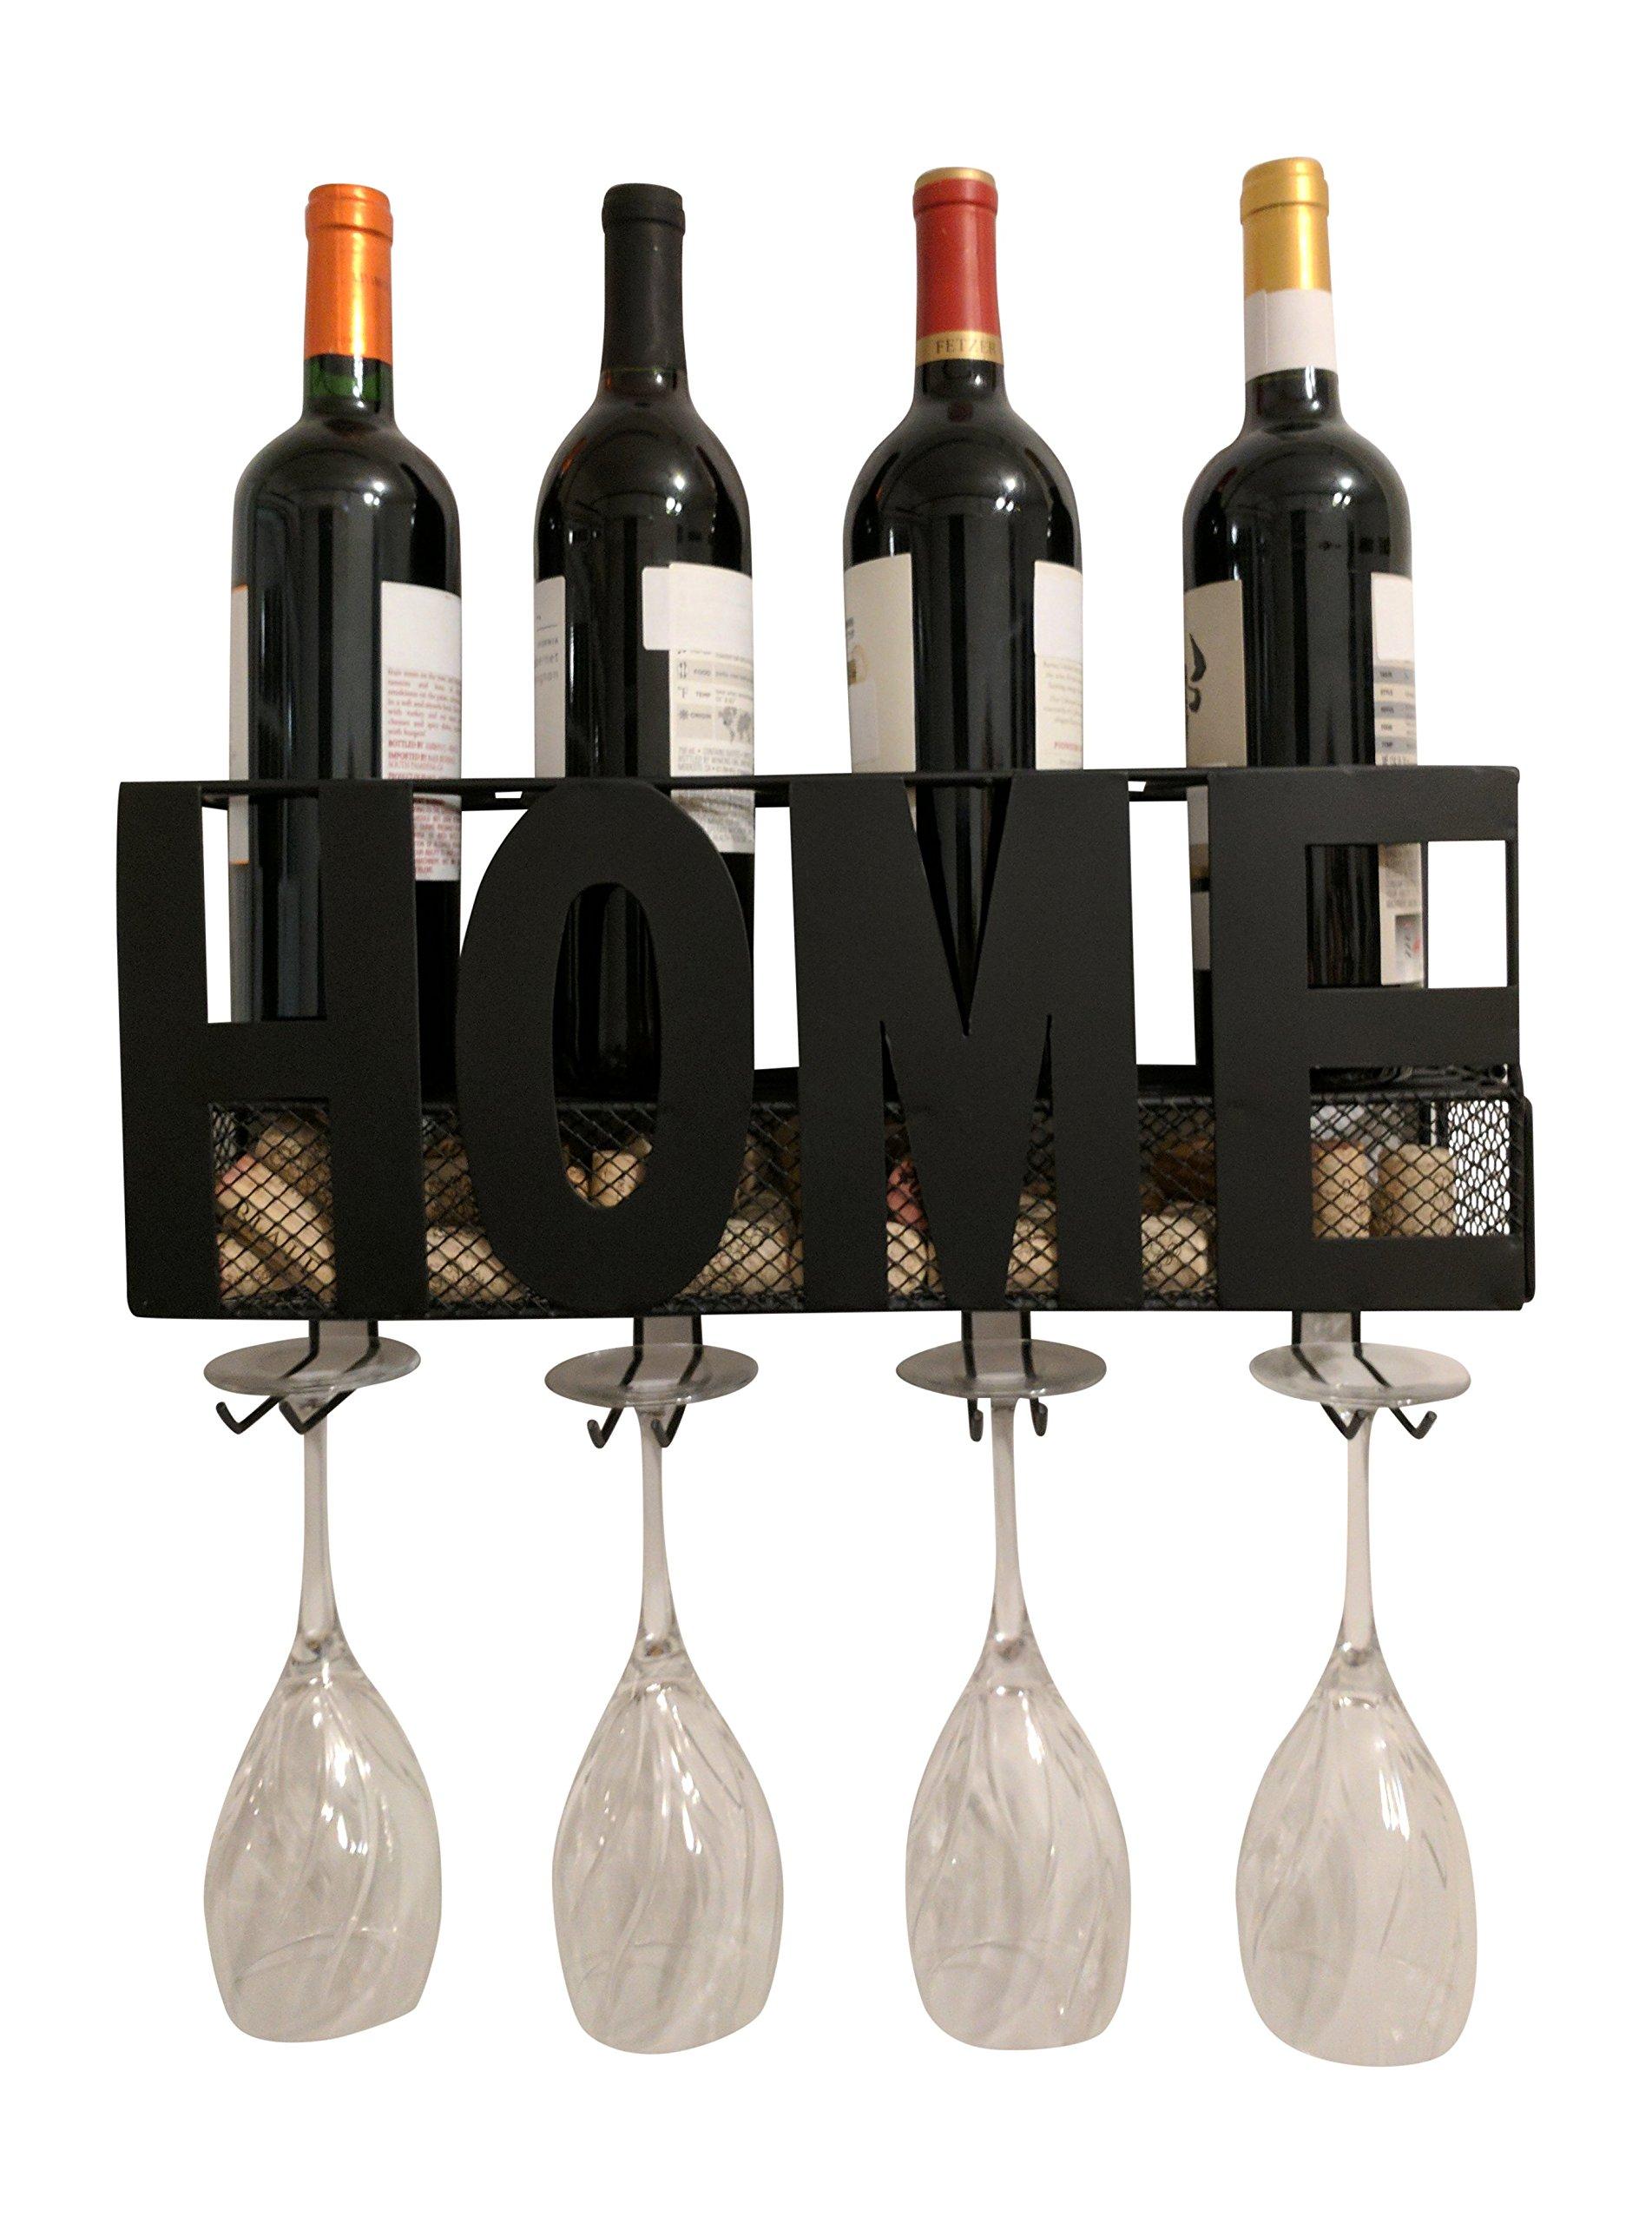 Gianna's Home Metal Wall Mounted Wine Rack and Cork Holder (Home)